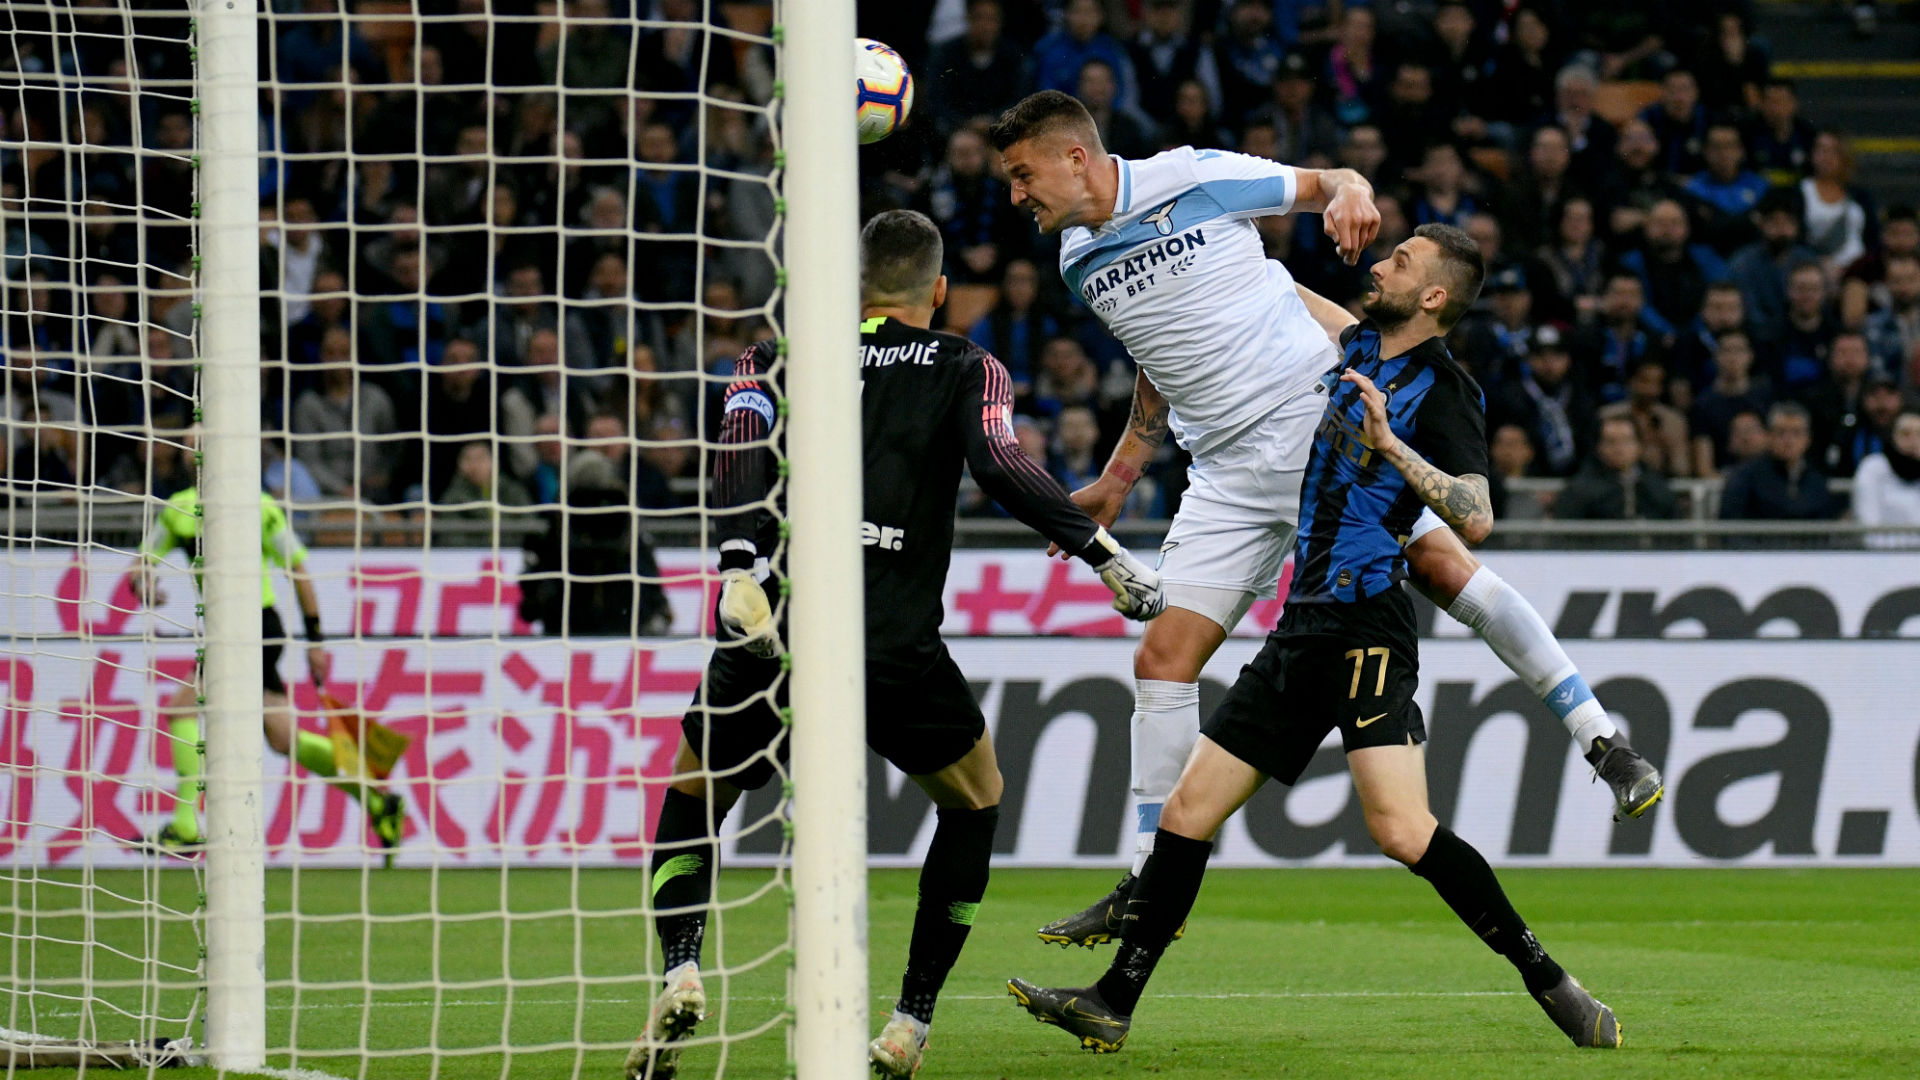 Inter 0 Lazio 1: Milinkovic-Savic header boosts Champions League hopes